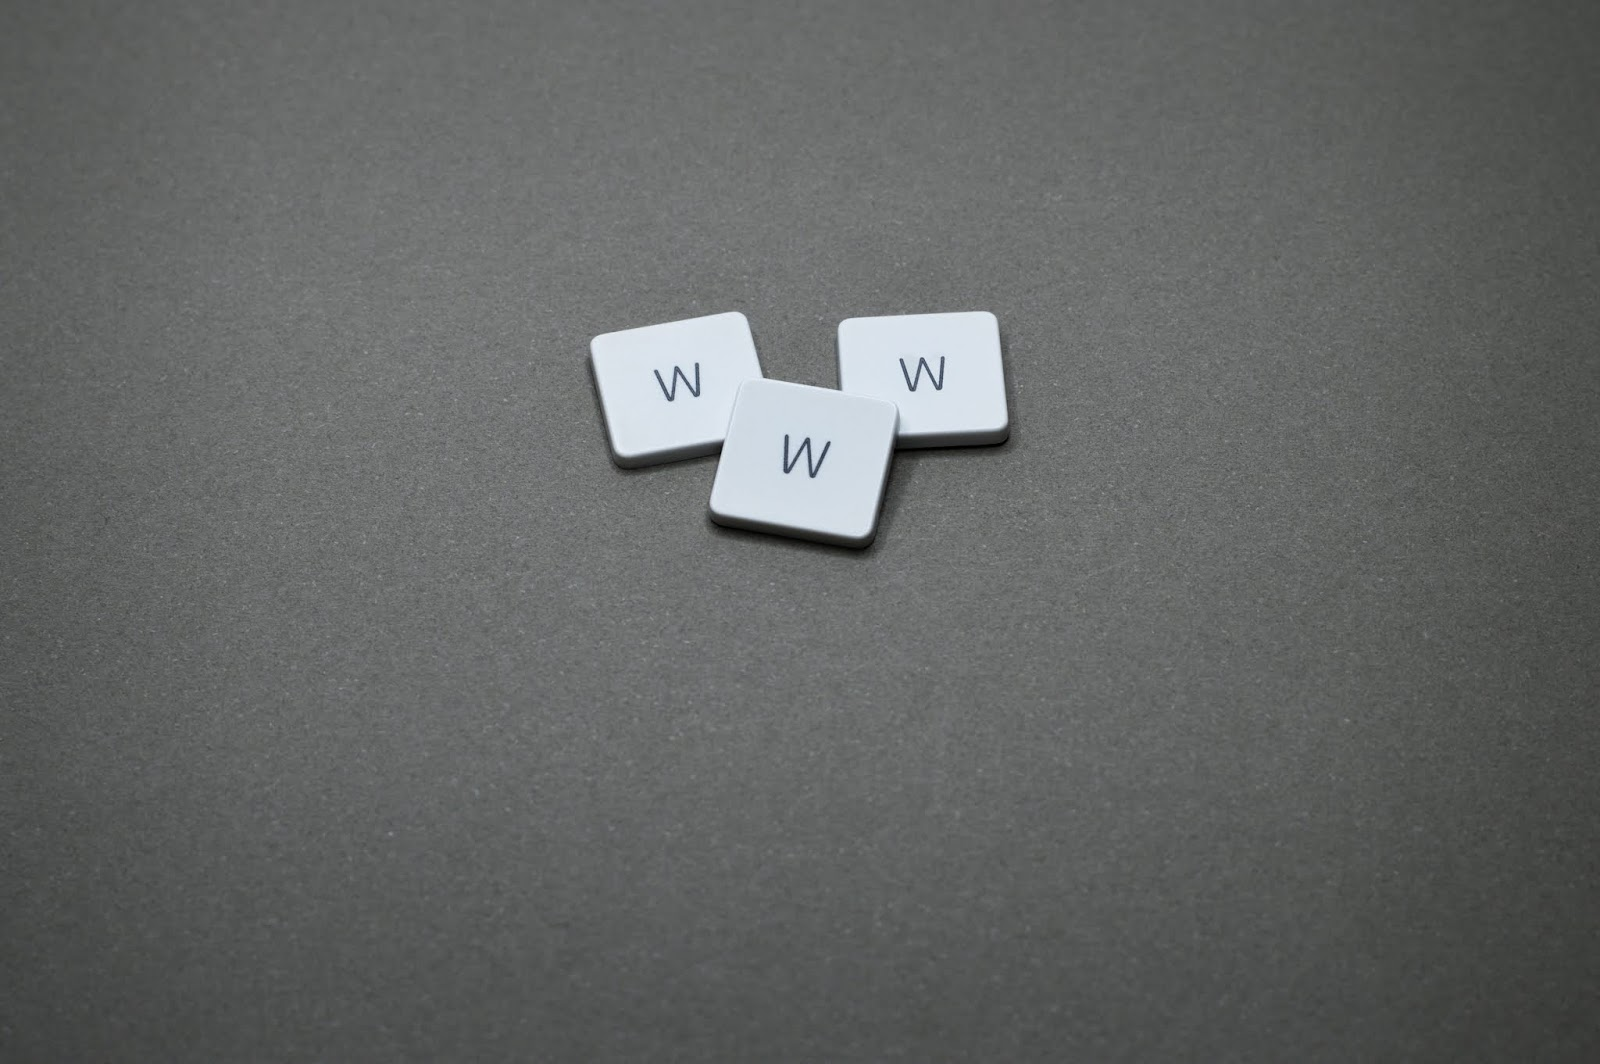 Pengertian WWW Beserta Fungsi, Contoh, Dan Manfaatnya